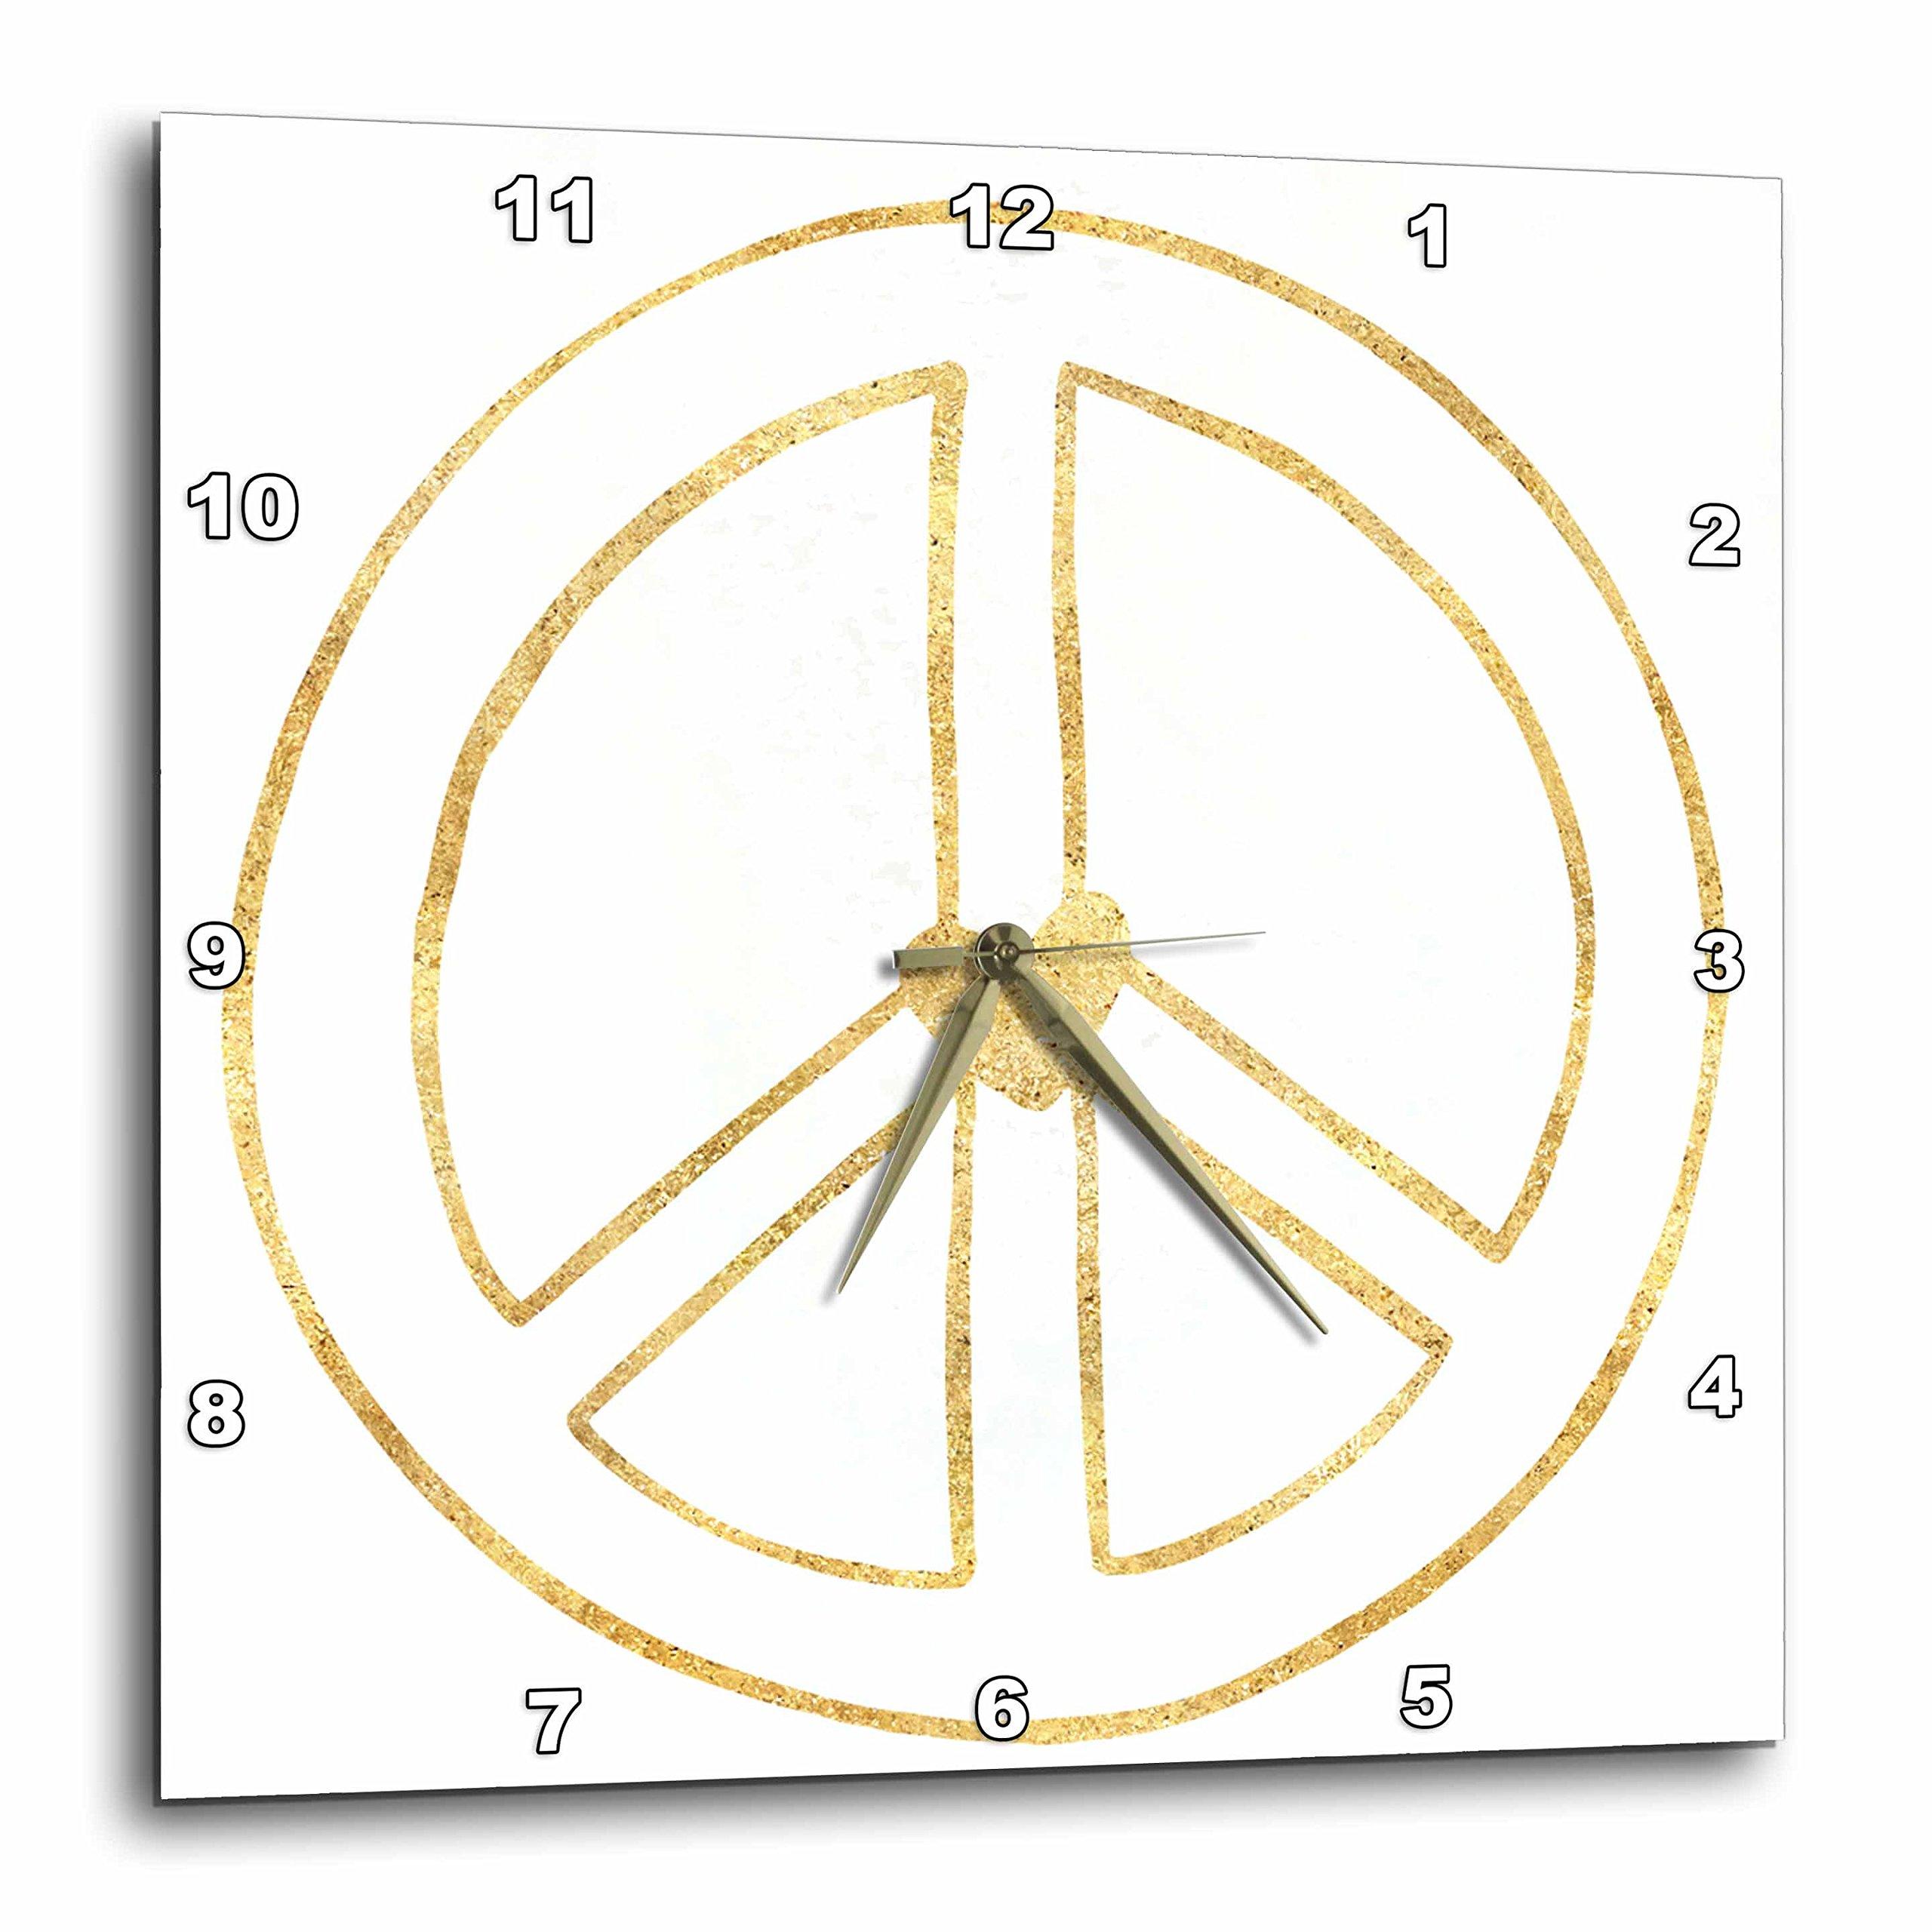 3dRose PS Inspiration - Gold Heart Hollow Peace Sign - 13x13 Wall Clock (dpp_280753_2)